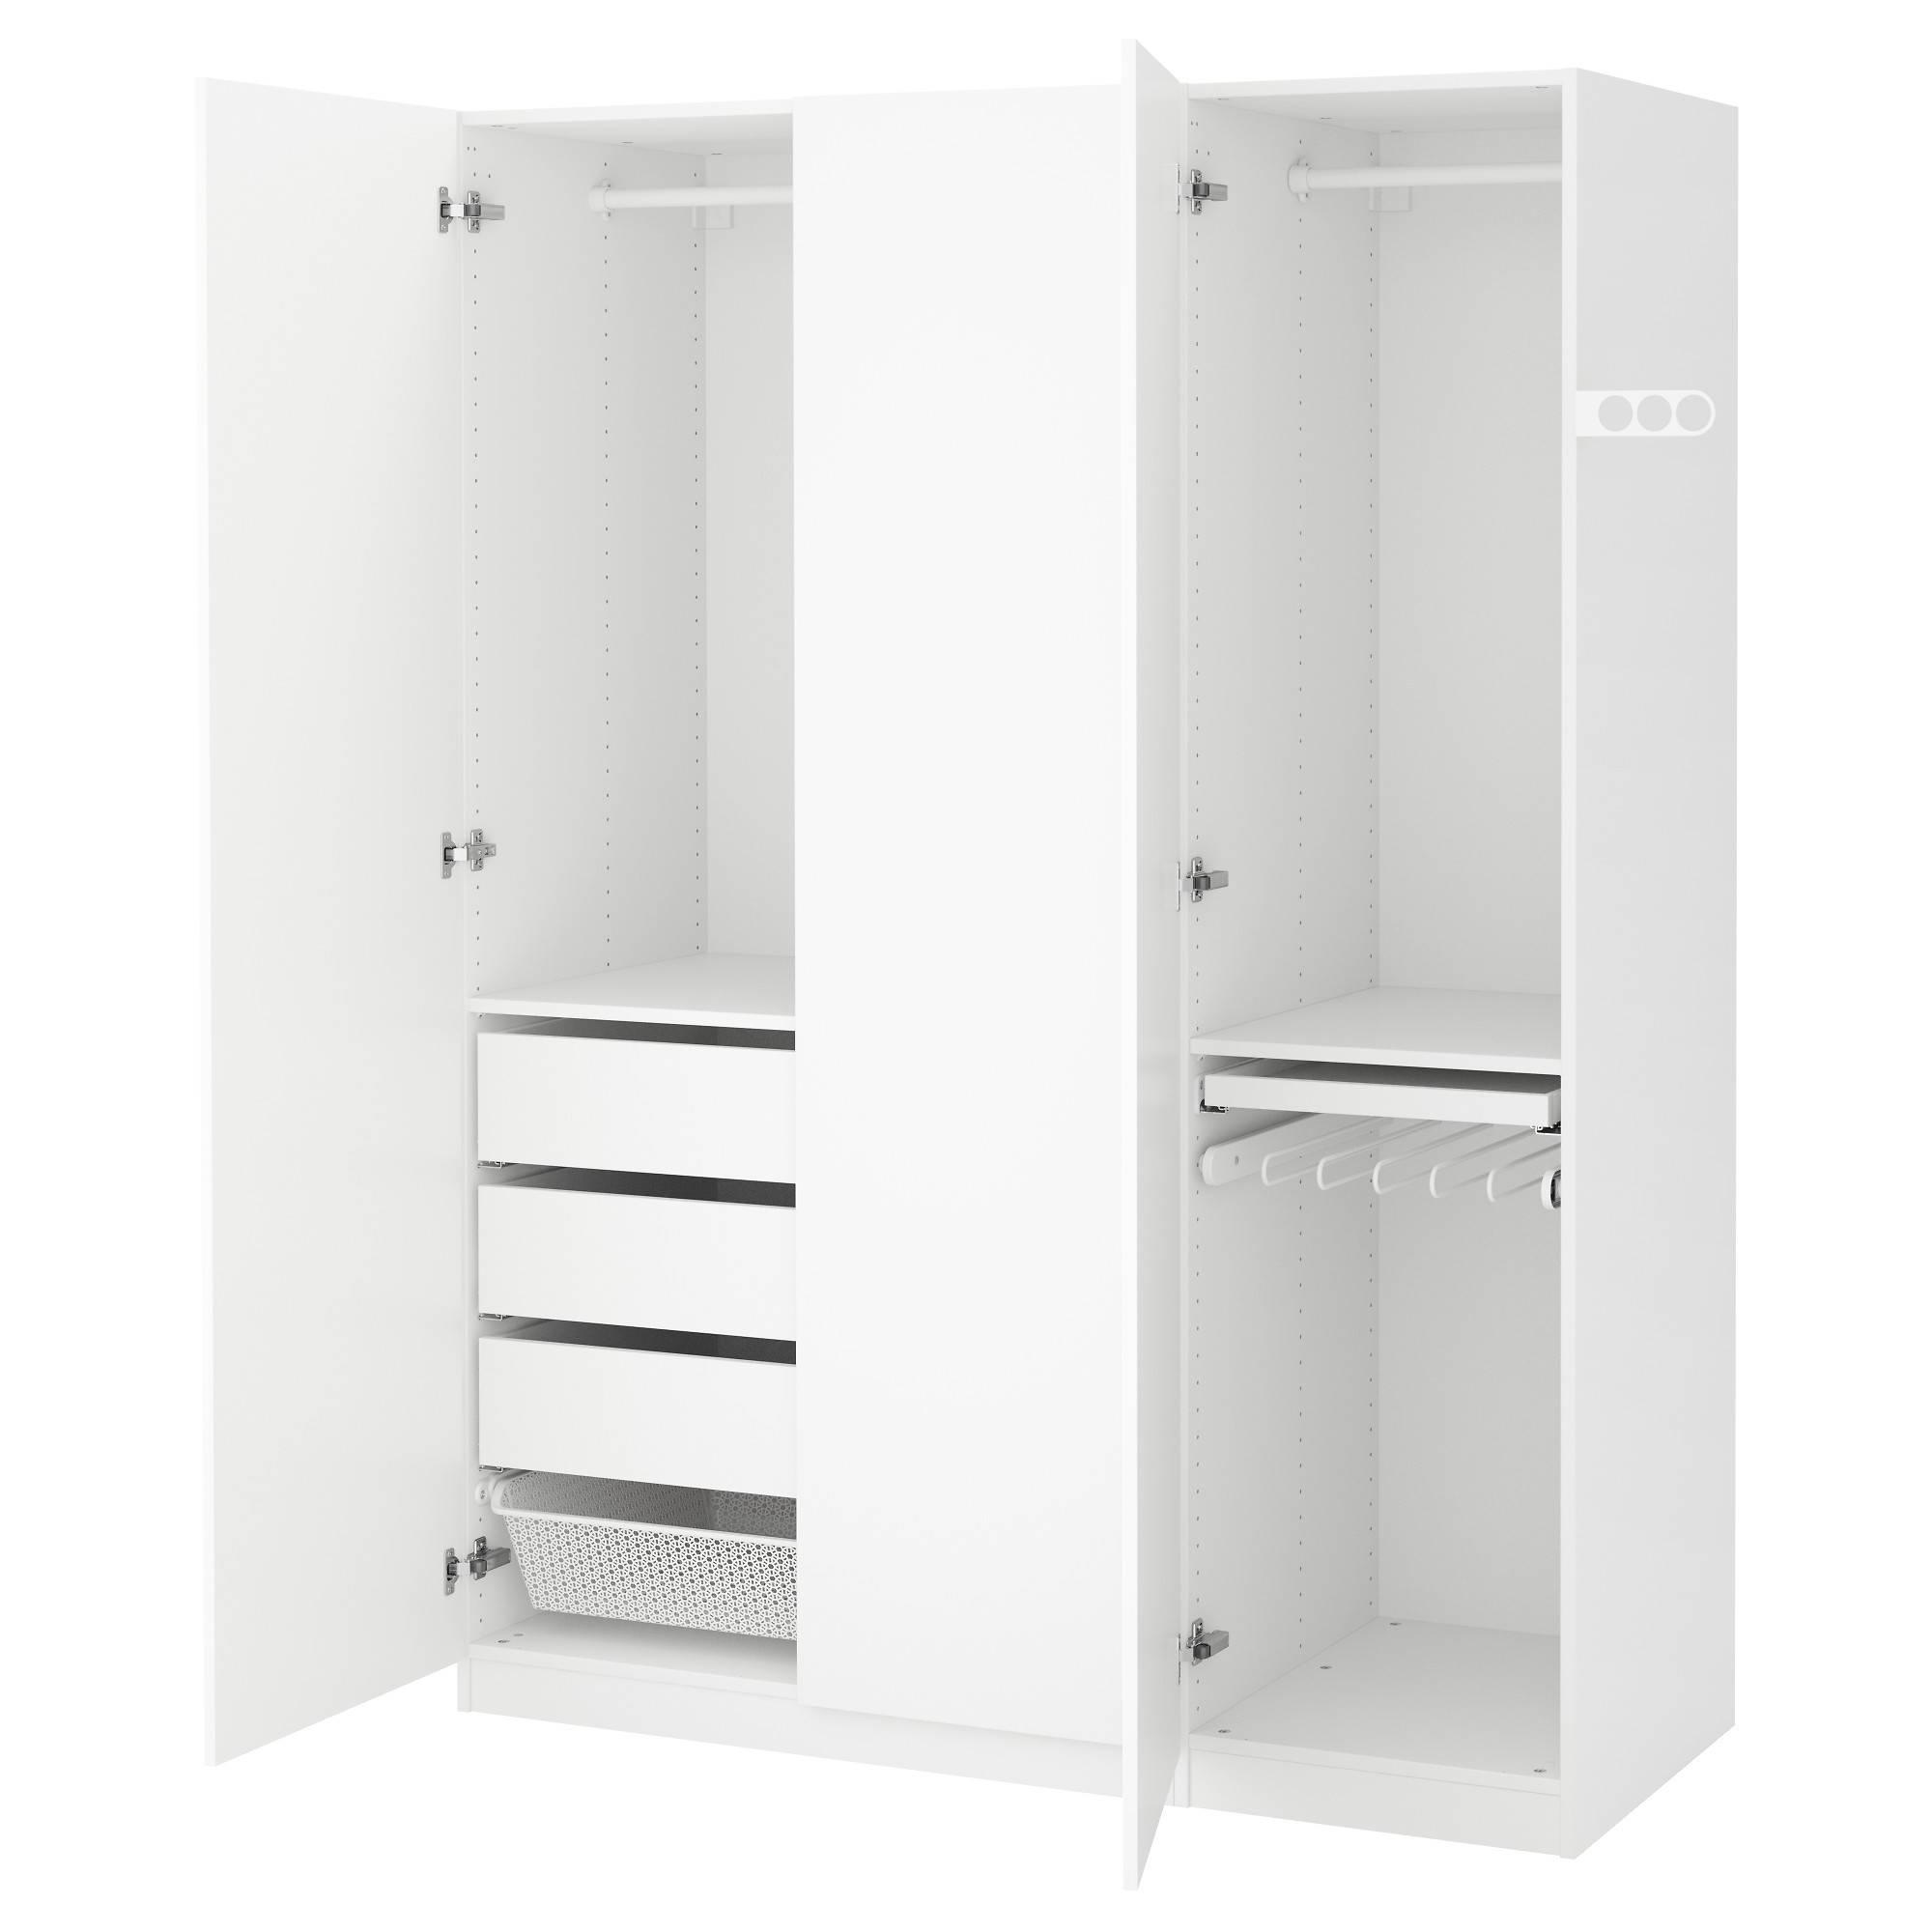 Wardrobes | Ikea Regarding Black Single Door Wardrobes (View 4 of 15)